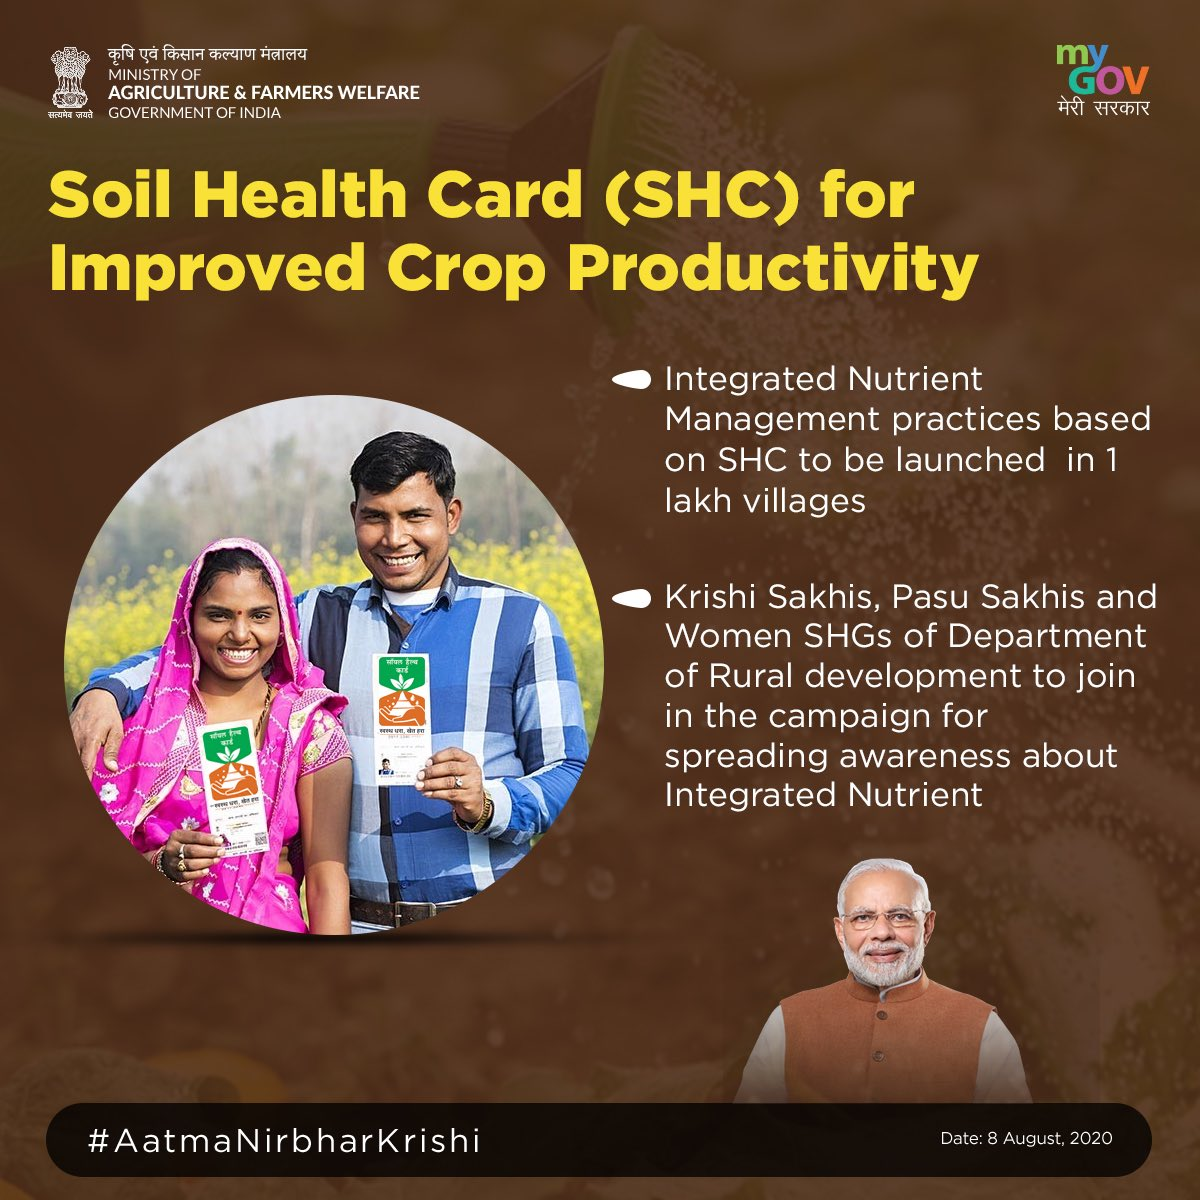 Soil Health Card (SHC) for improved crop productivity.   #AatmaNirbharKrishi https://t.co/ulwHcxO89y